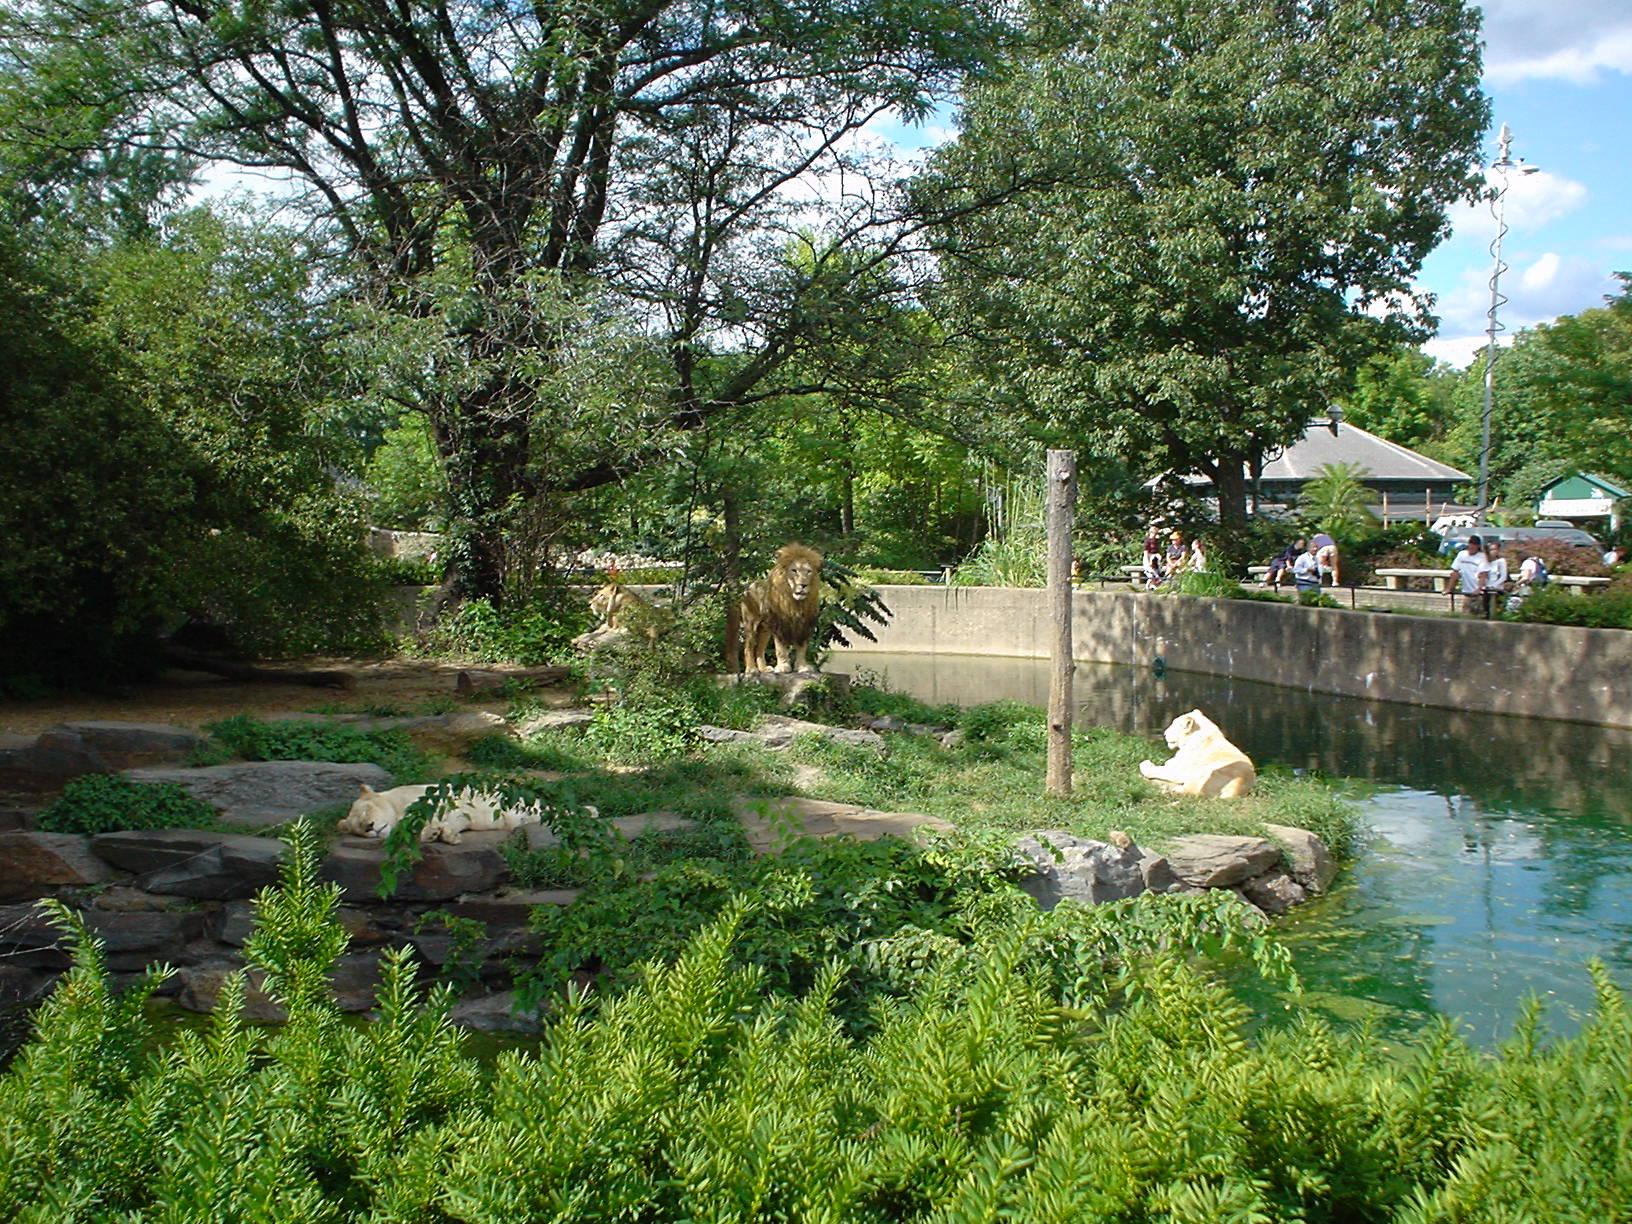 #philly #Philadelphia #pa #Pennsylvania #aug2004 #phillyzoo #zoo https://t.co/Jte5SUU6P1